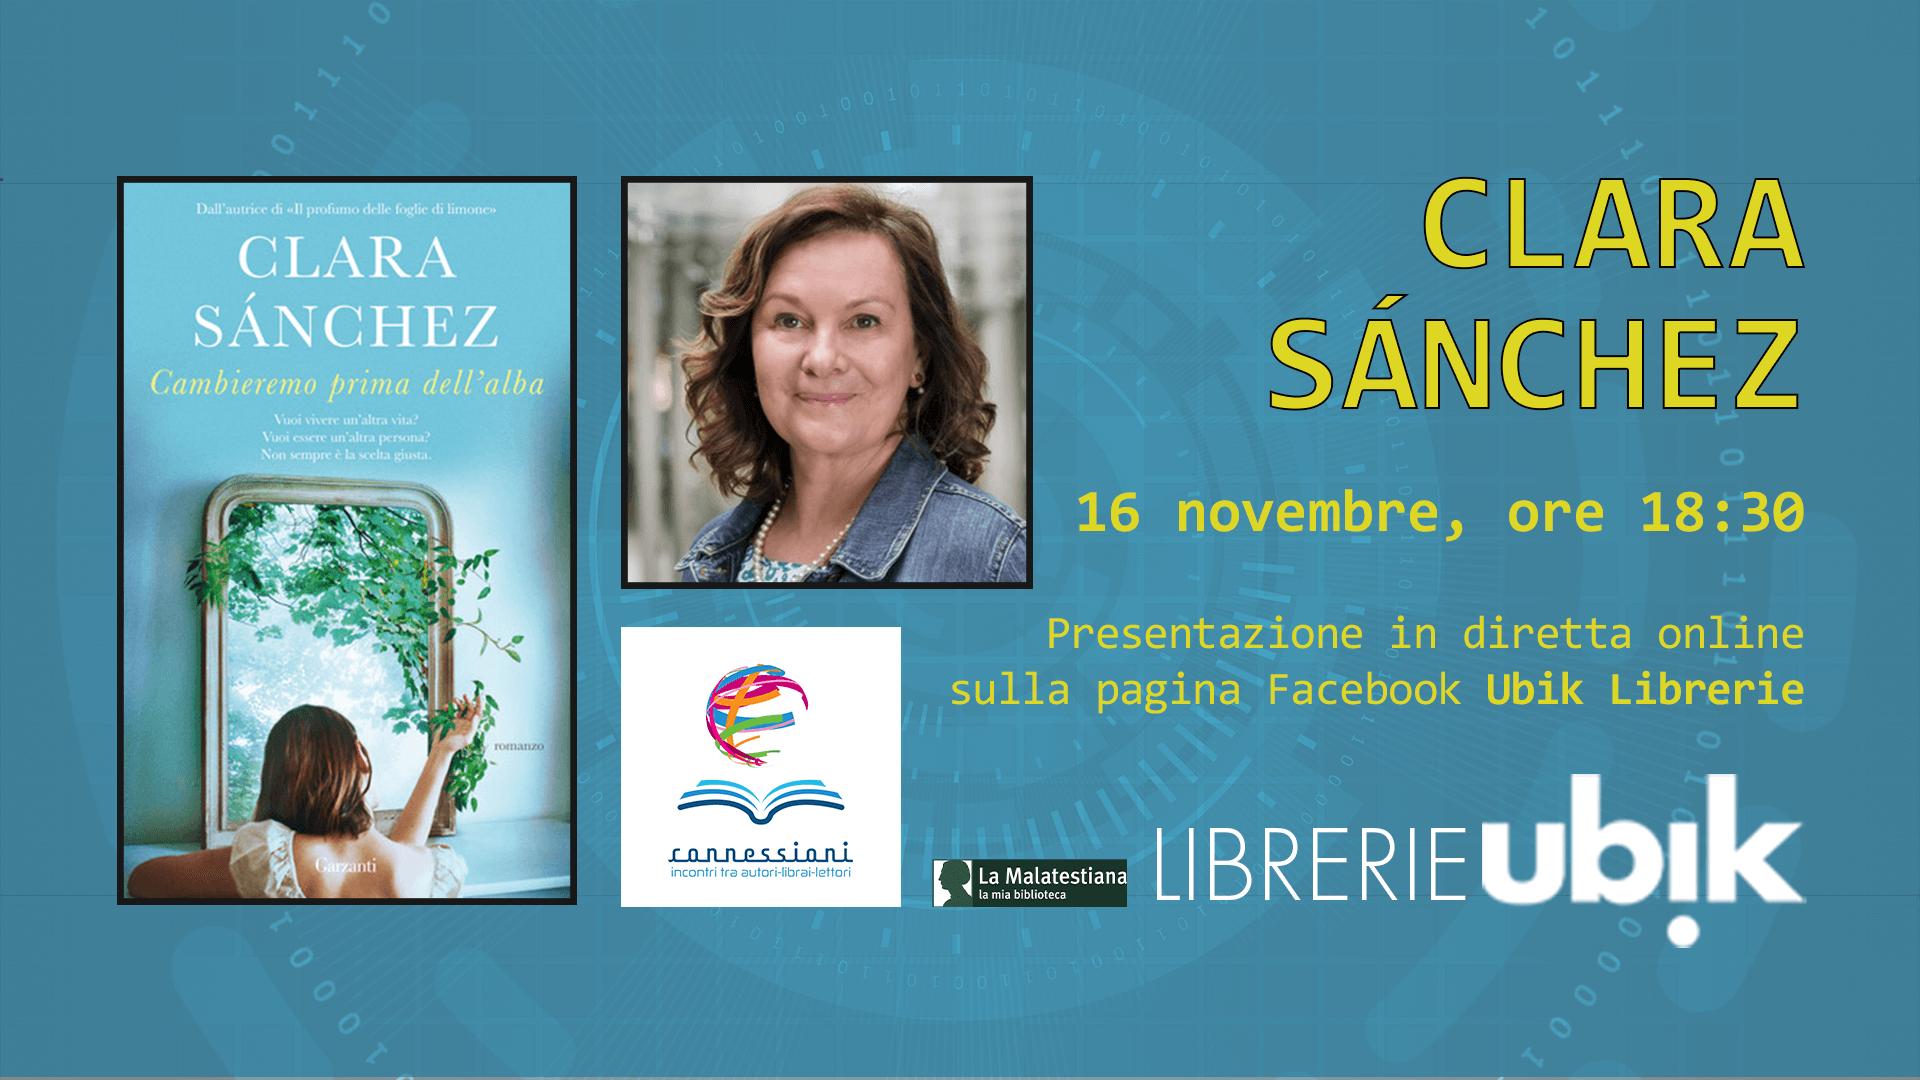 CLARA SANCHEZ presenta in diretta online